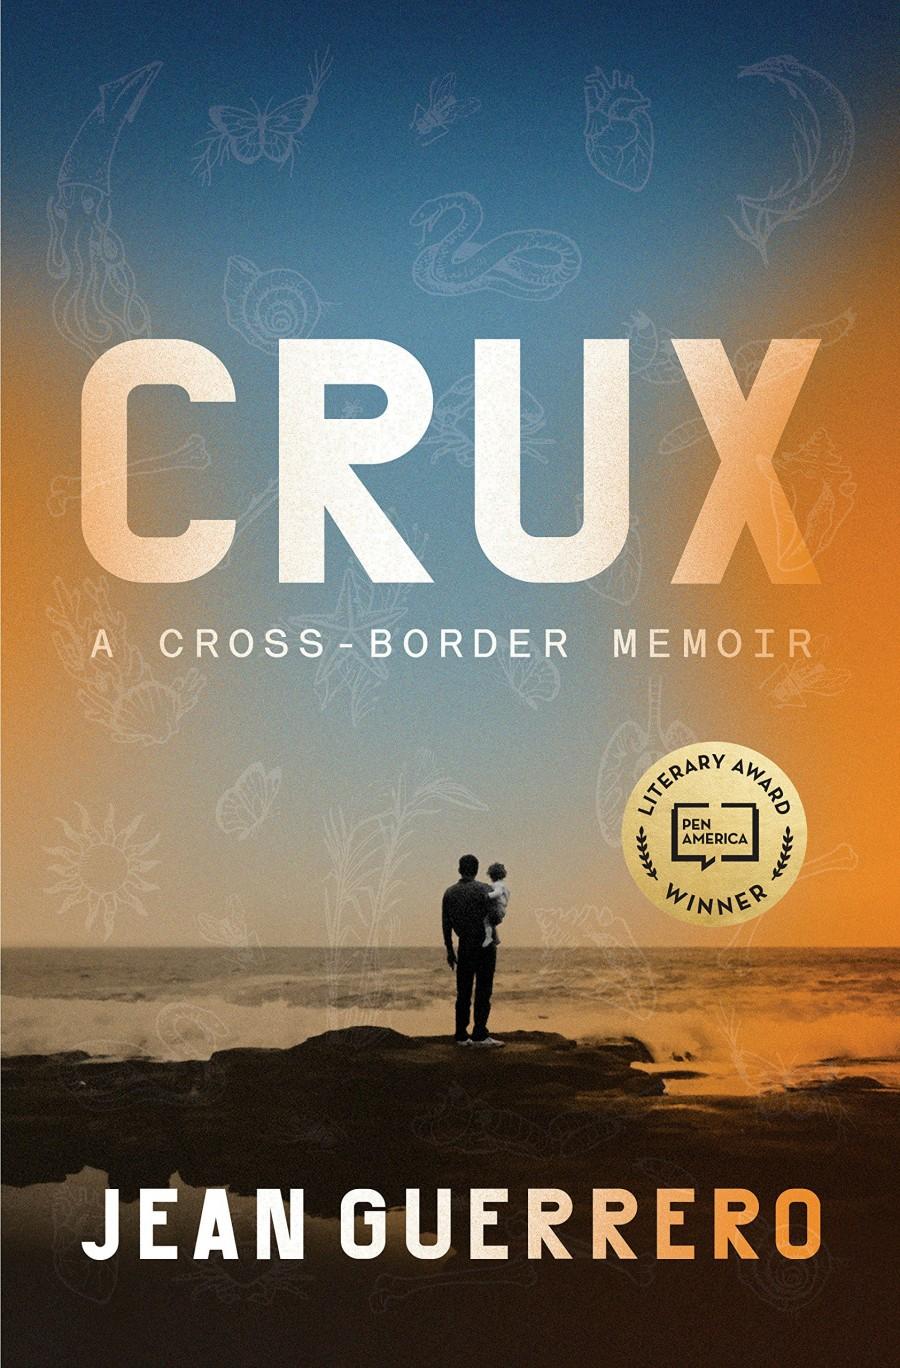 Crux: A Cross-Border Memoir by Jean Guerrero